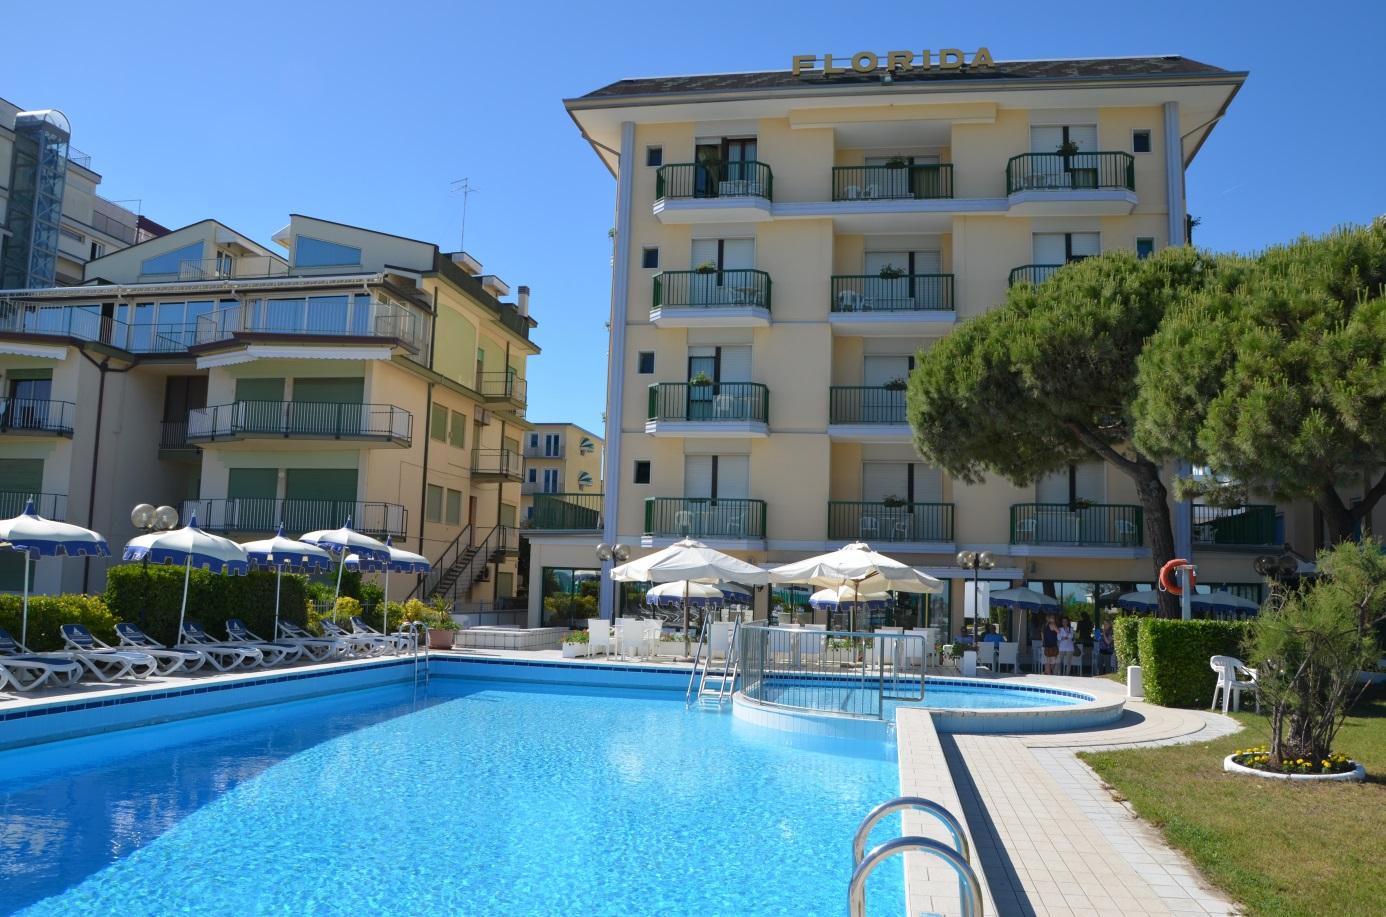 Rollstuhlgerechte Hotels Italien